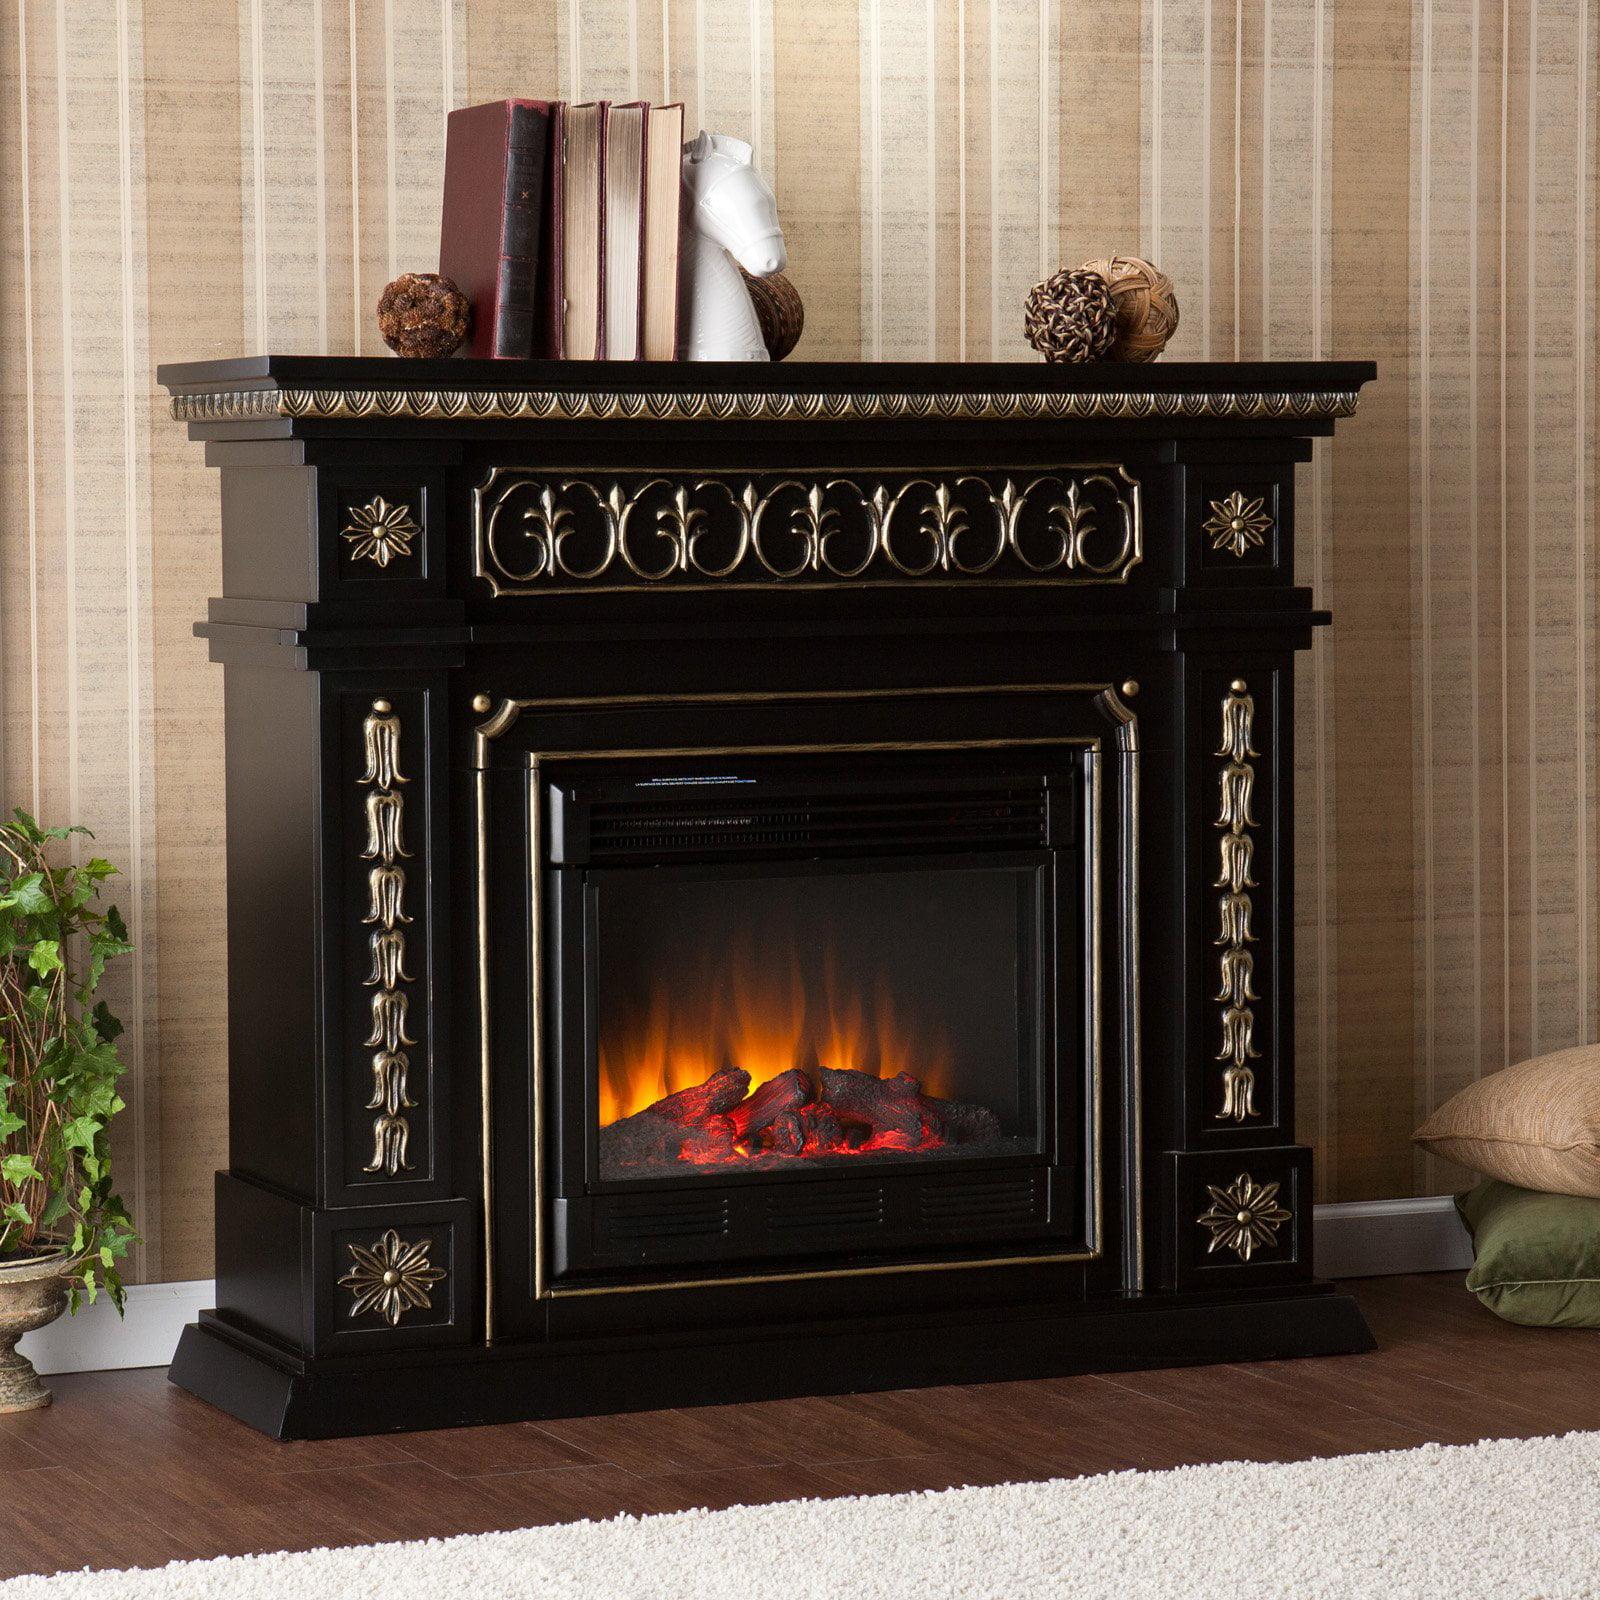 Southern Enterprises Theseus Electric Fireplace - Black